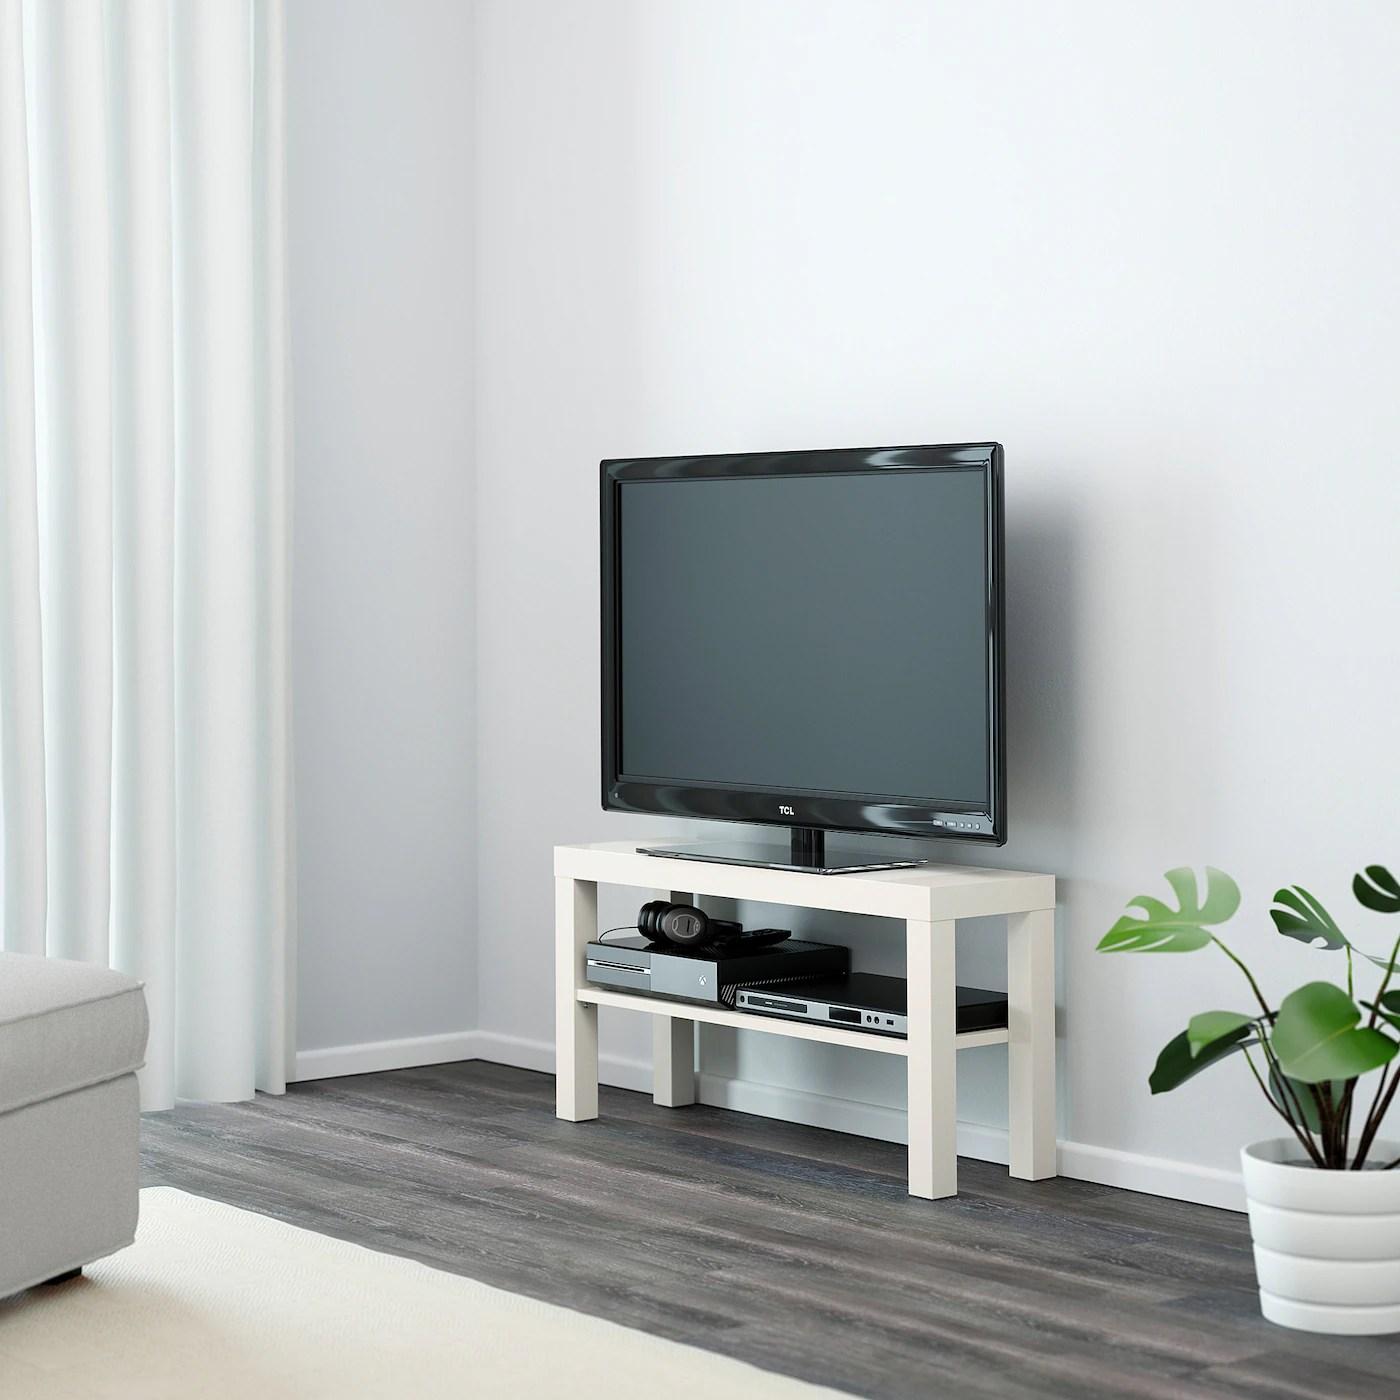 Lack Tv Bench White 353 8x101 4x173 4 90x26x45 Cm Ikea